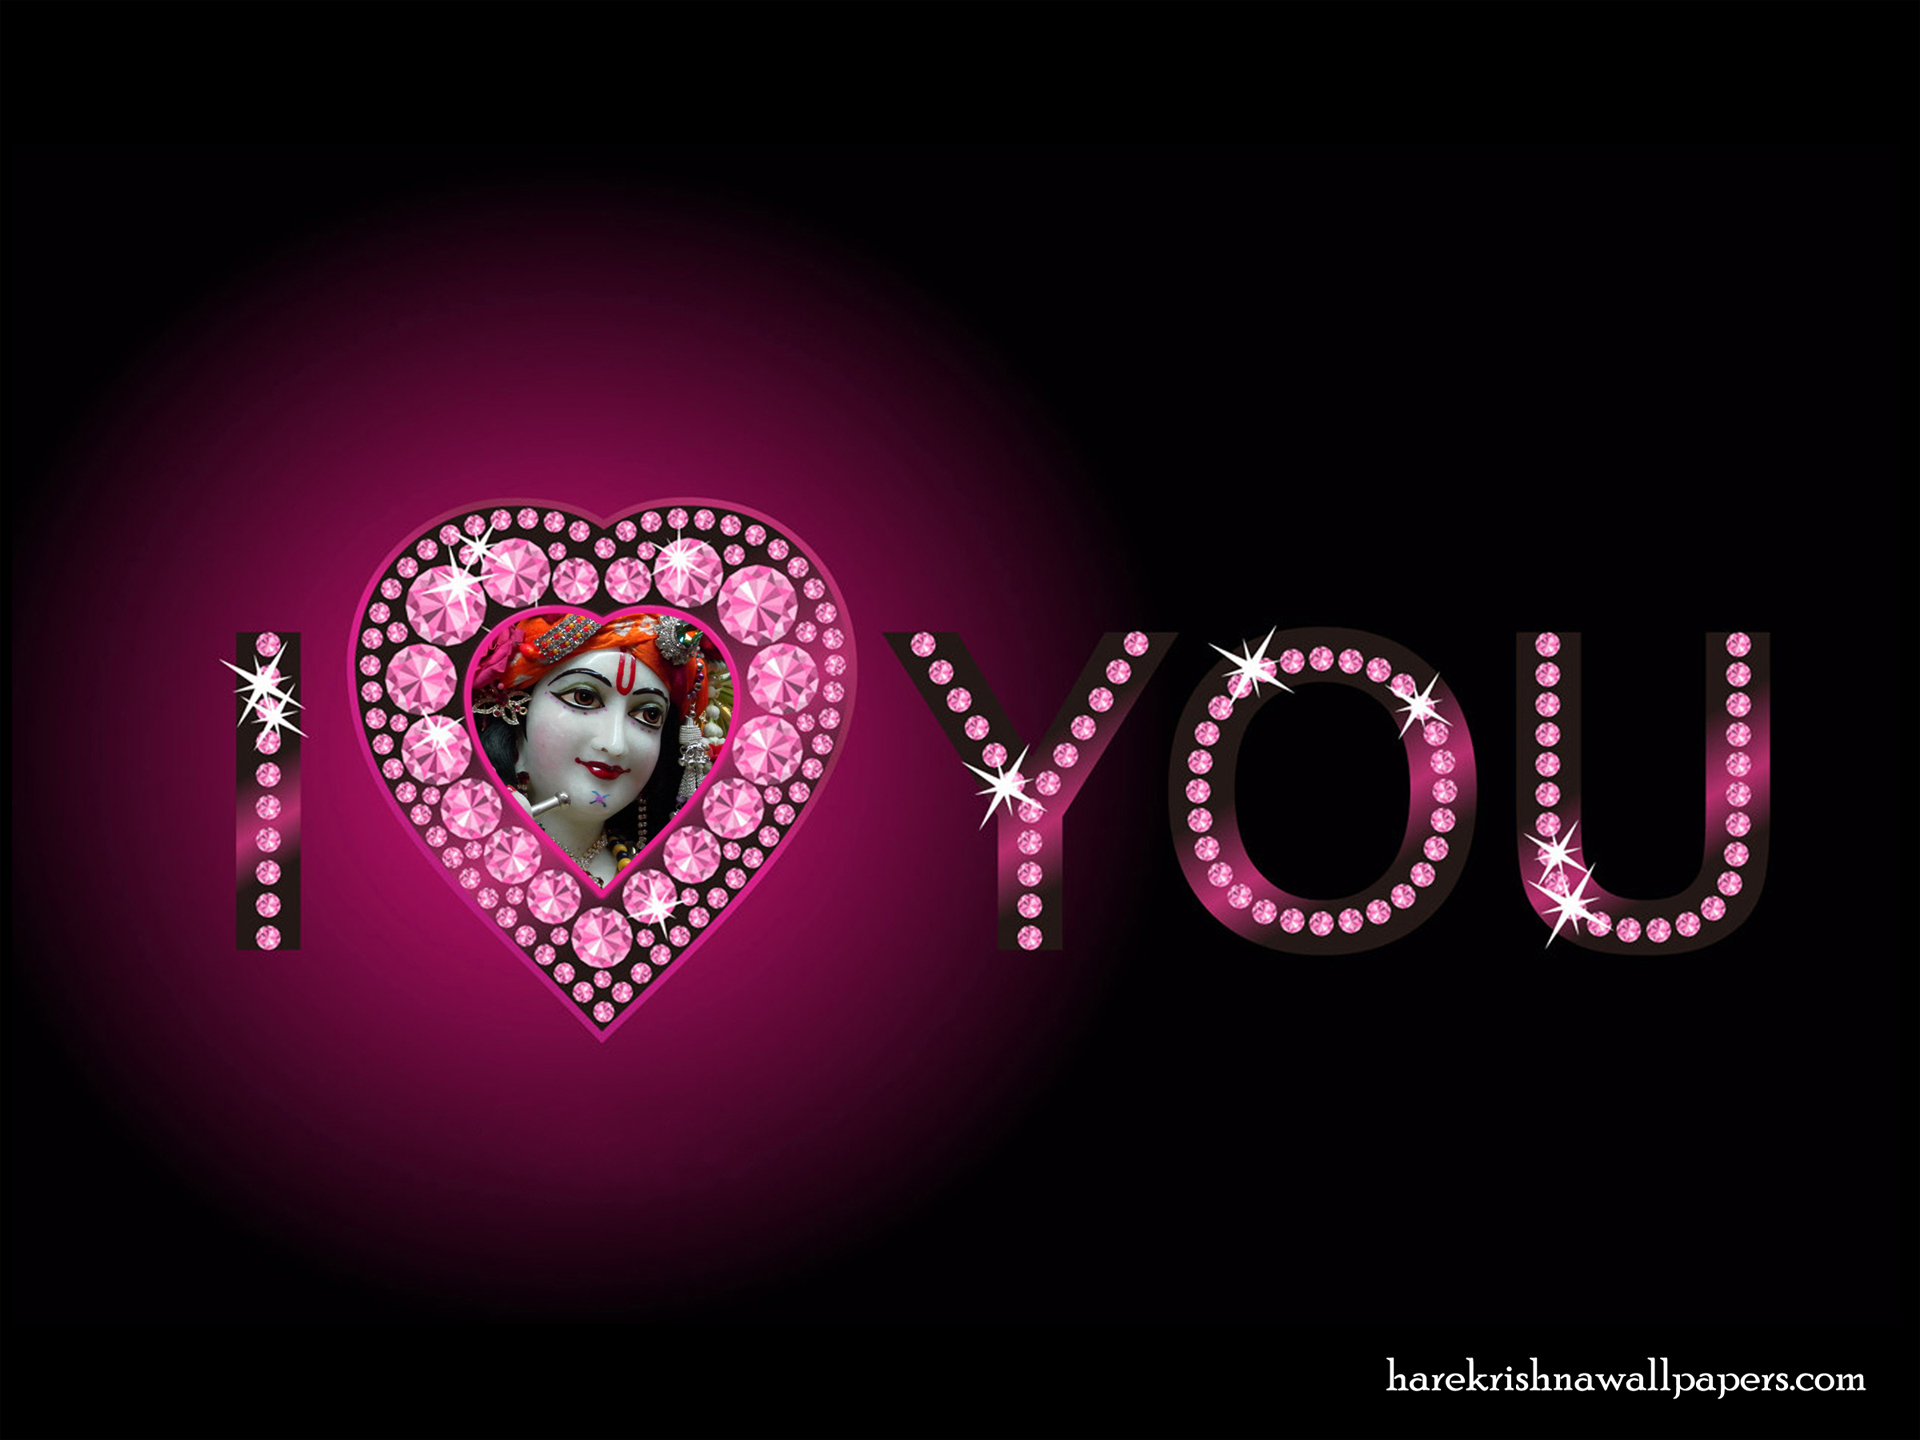 I Love You Giridhari Wallpaper (010) Size 1920x1440 Download